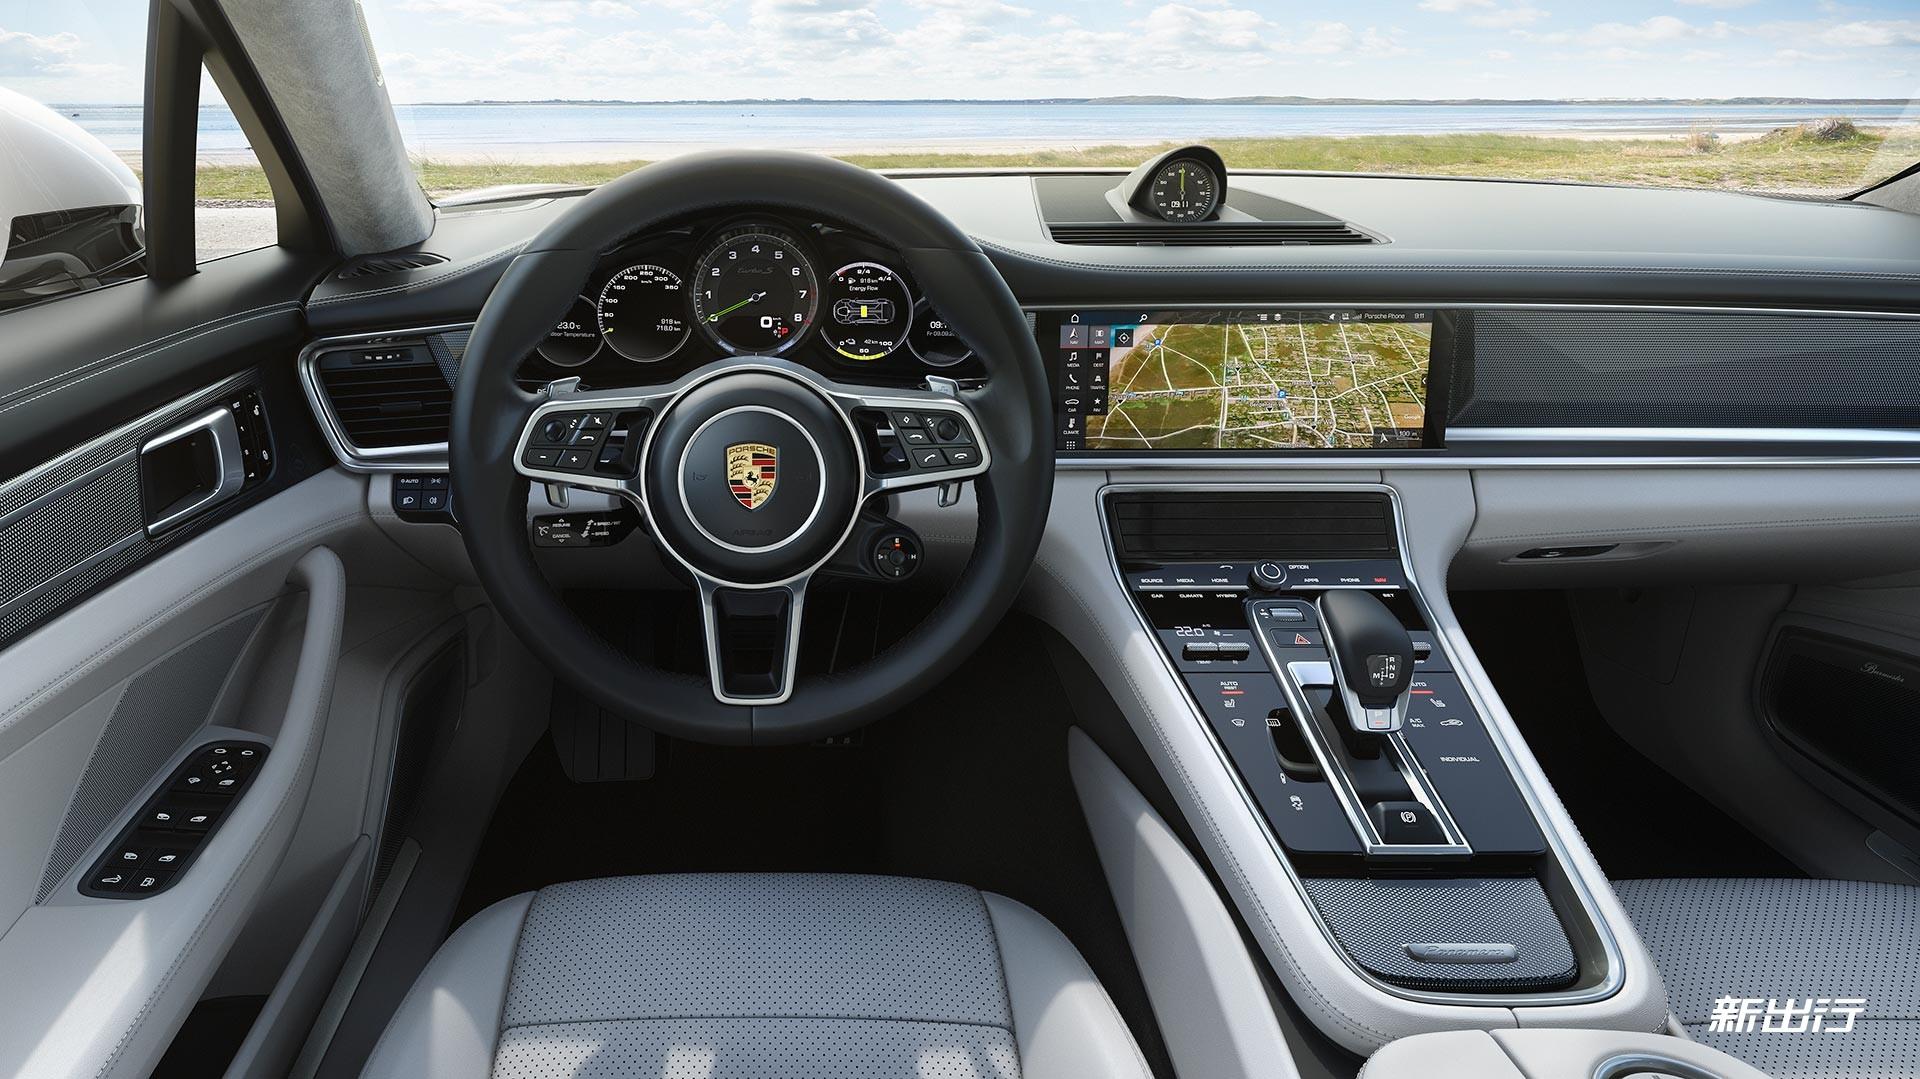 2018-Panamera-Turbo-S-E-Hybrid-Sport-Turismo-Interior.jpg